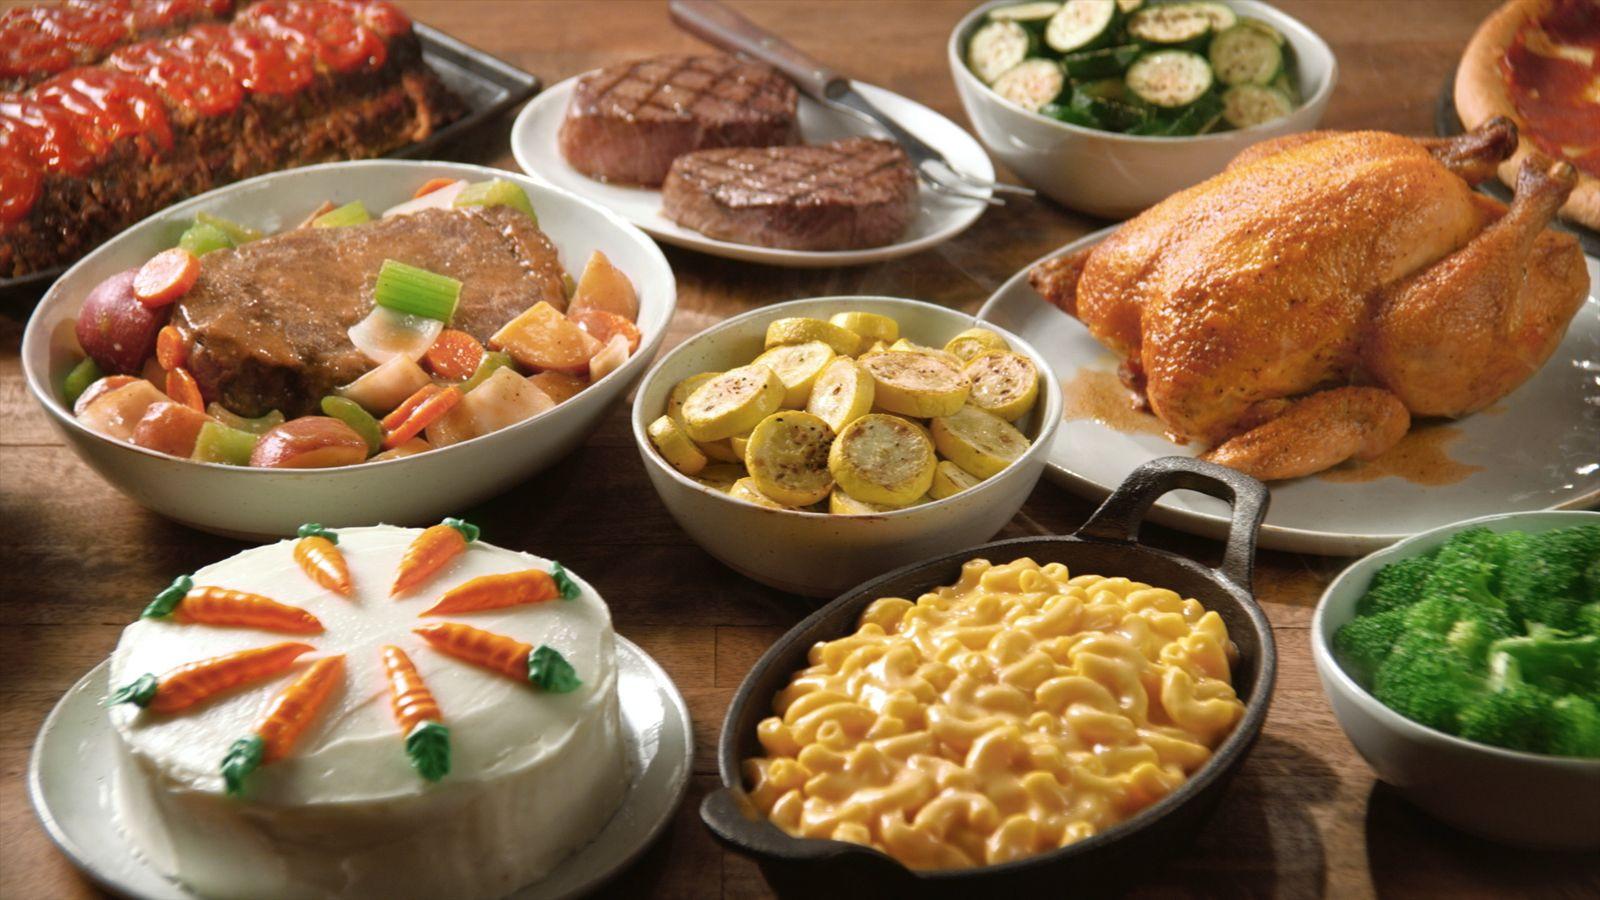 Golden Corral Thanksgiving Dinner To Go  Golden Corral Menu Nutritional Information – Besto Blog